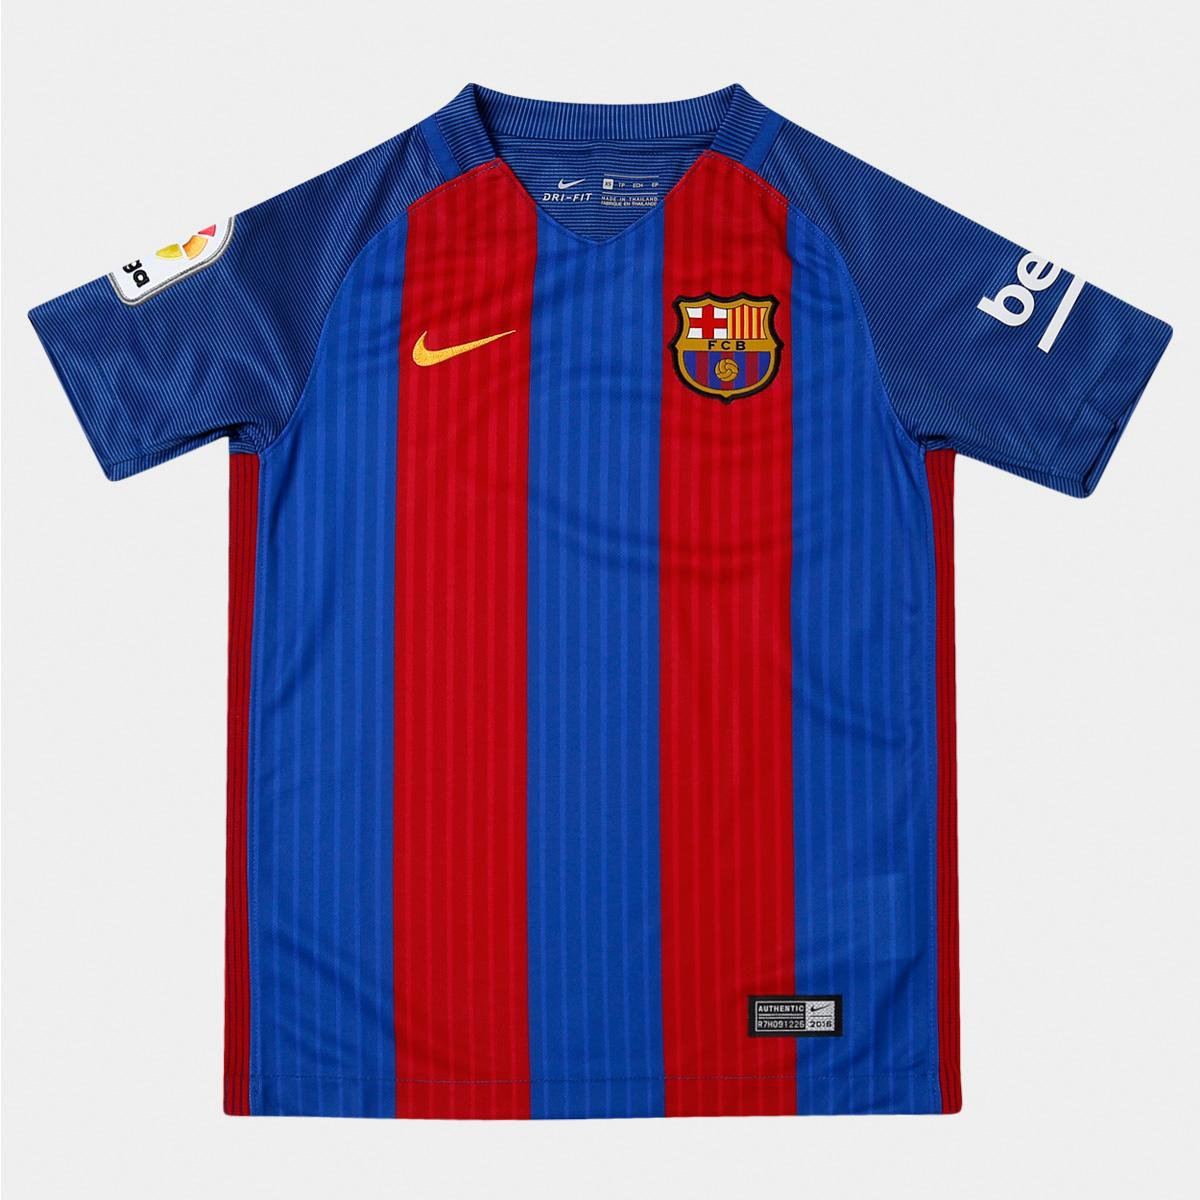 Camisa Barcelona Infantil Home 16 17 s nº Torcedor Nike - Compre ... 7d1e792a2d3dc